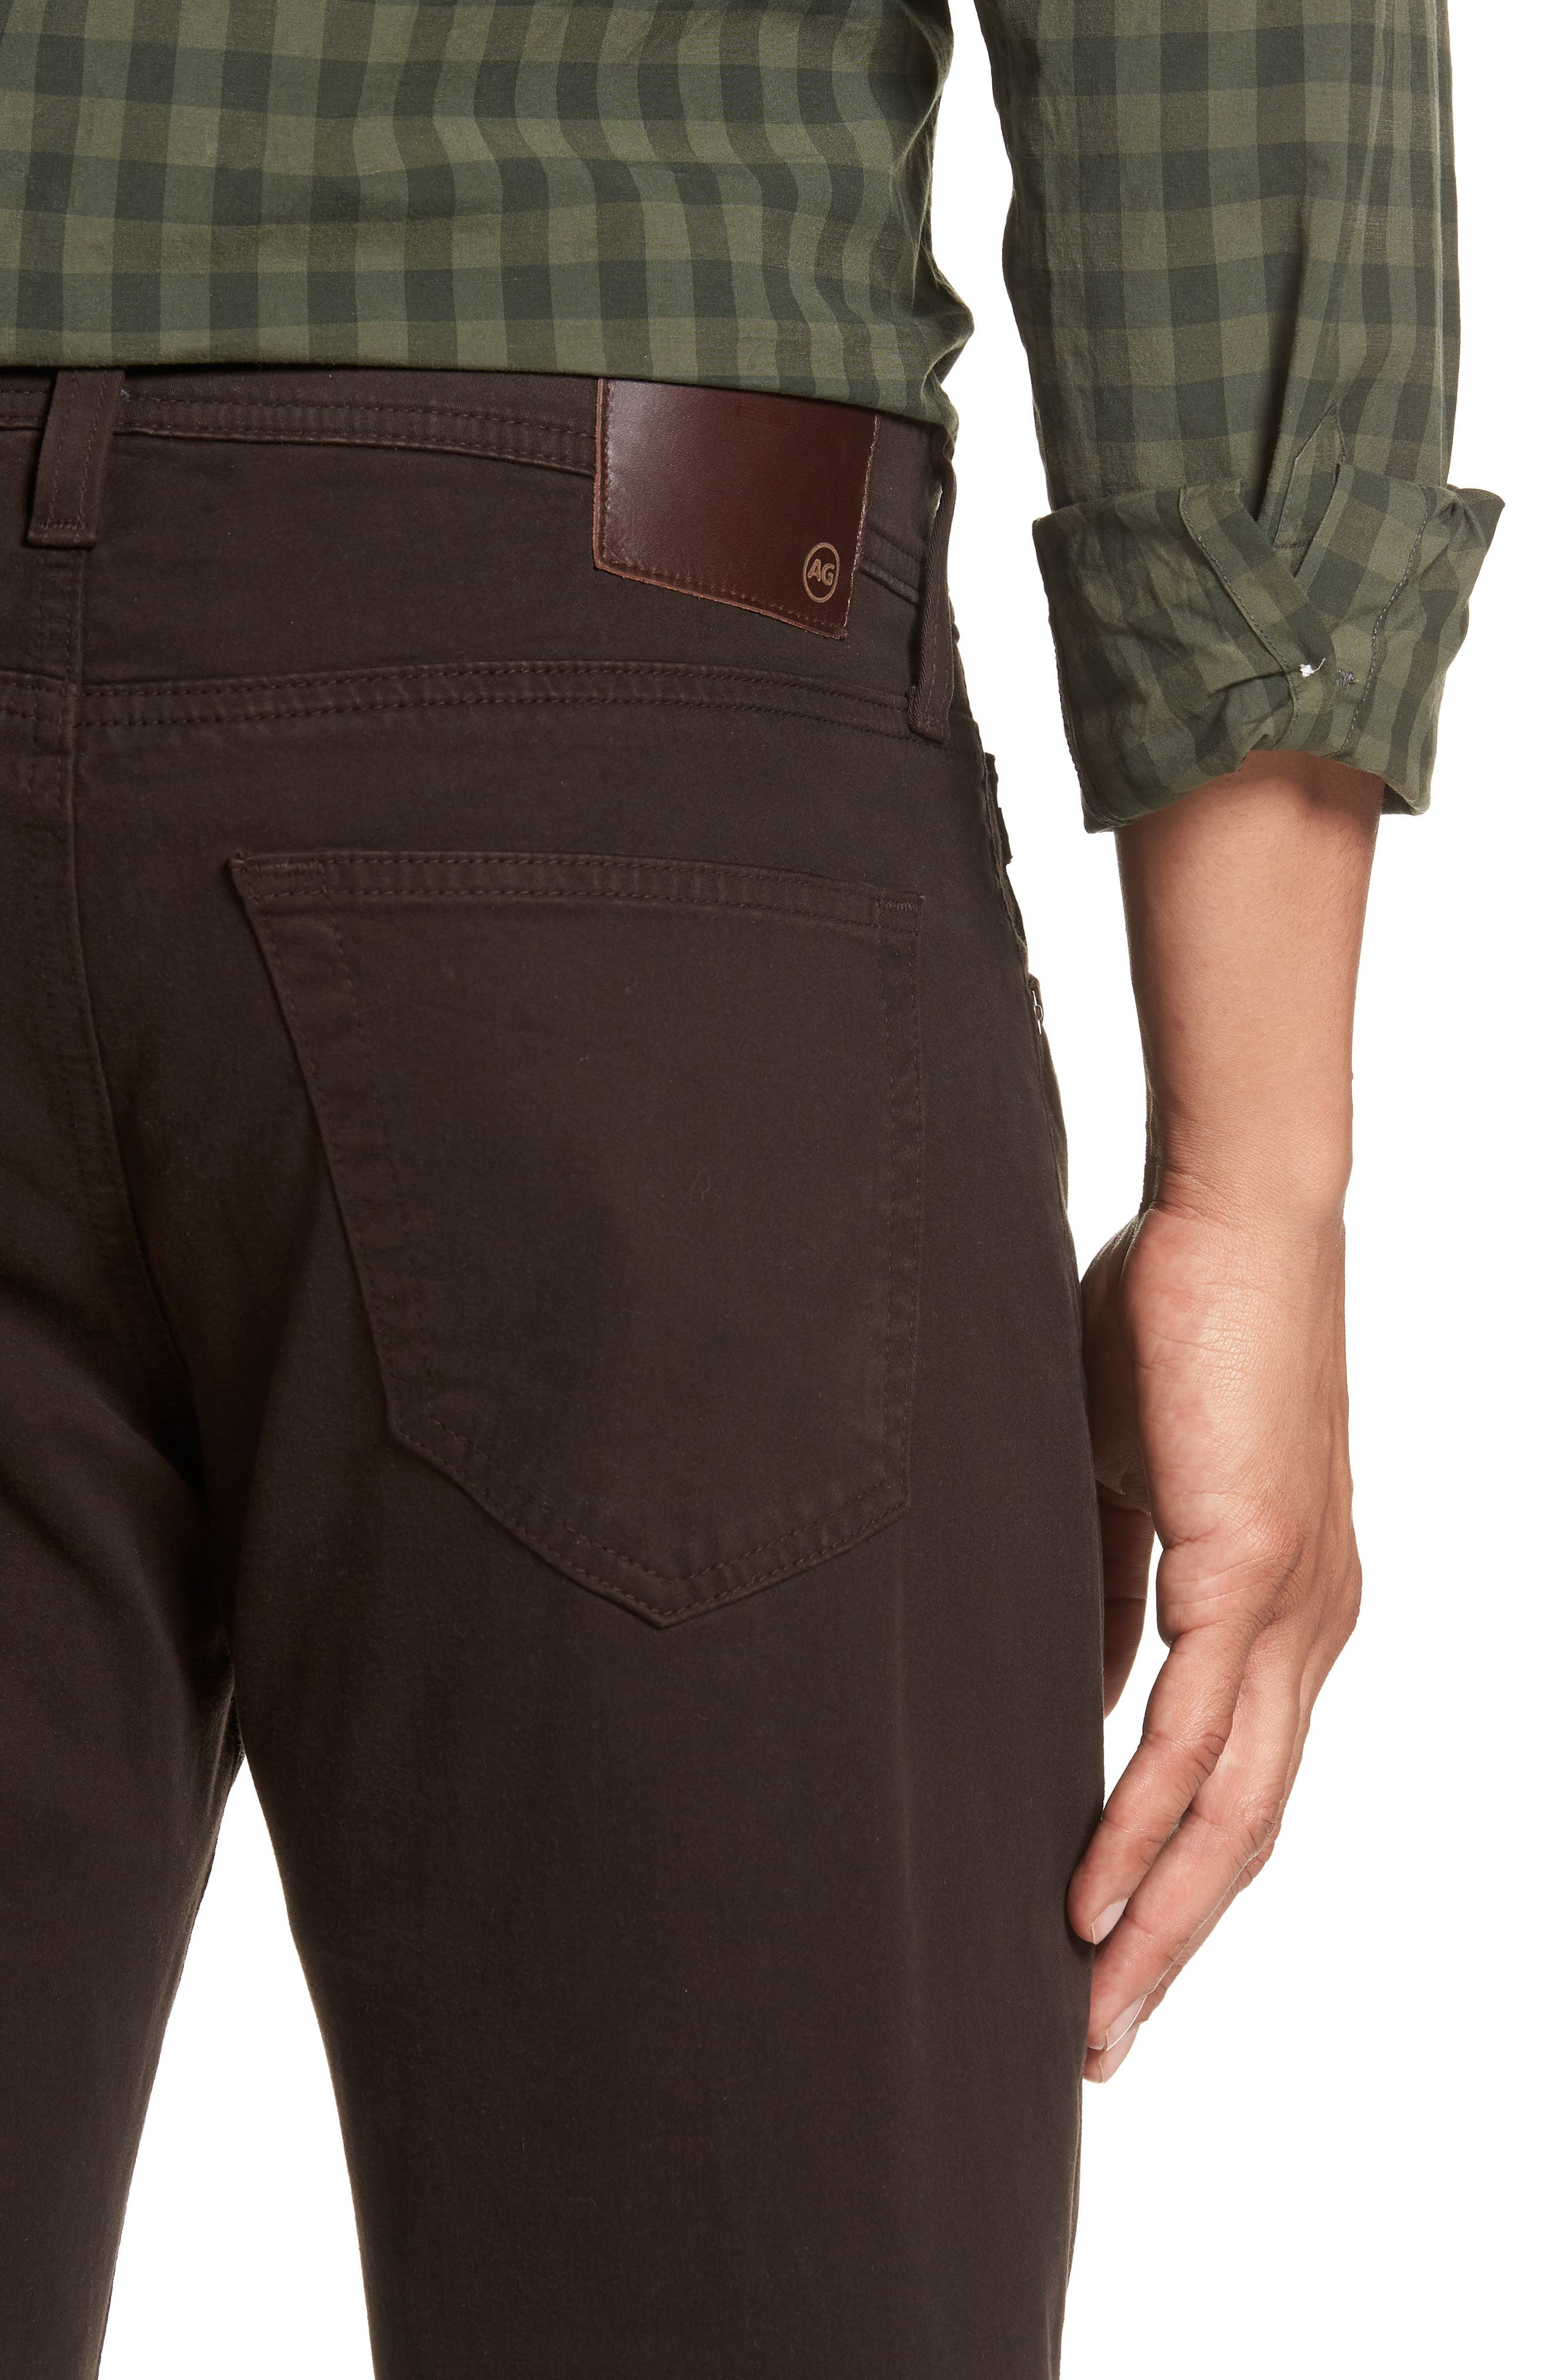 Tellis SUD Modern Slim Stretch Twill Pants,                             Alternate thumbnail 4, color,                             Shutter Brown